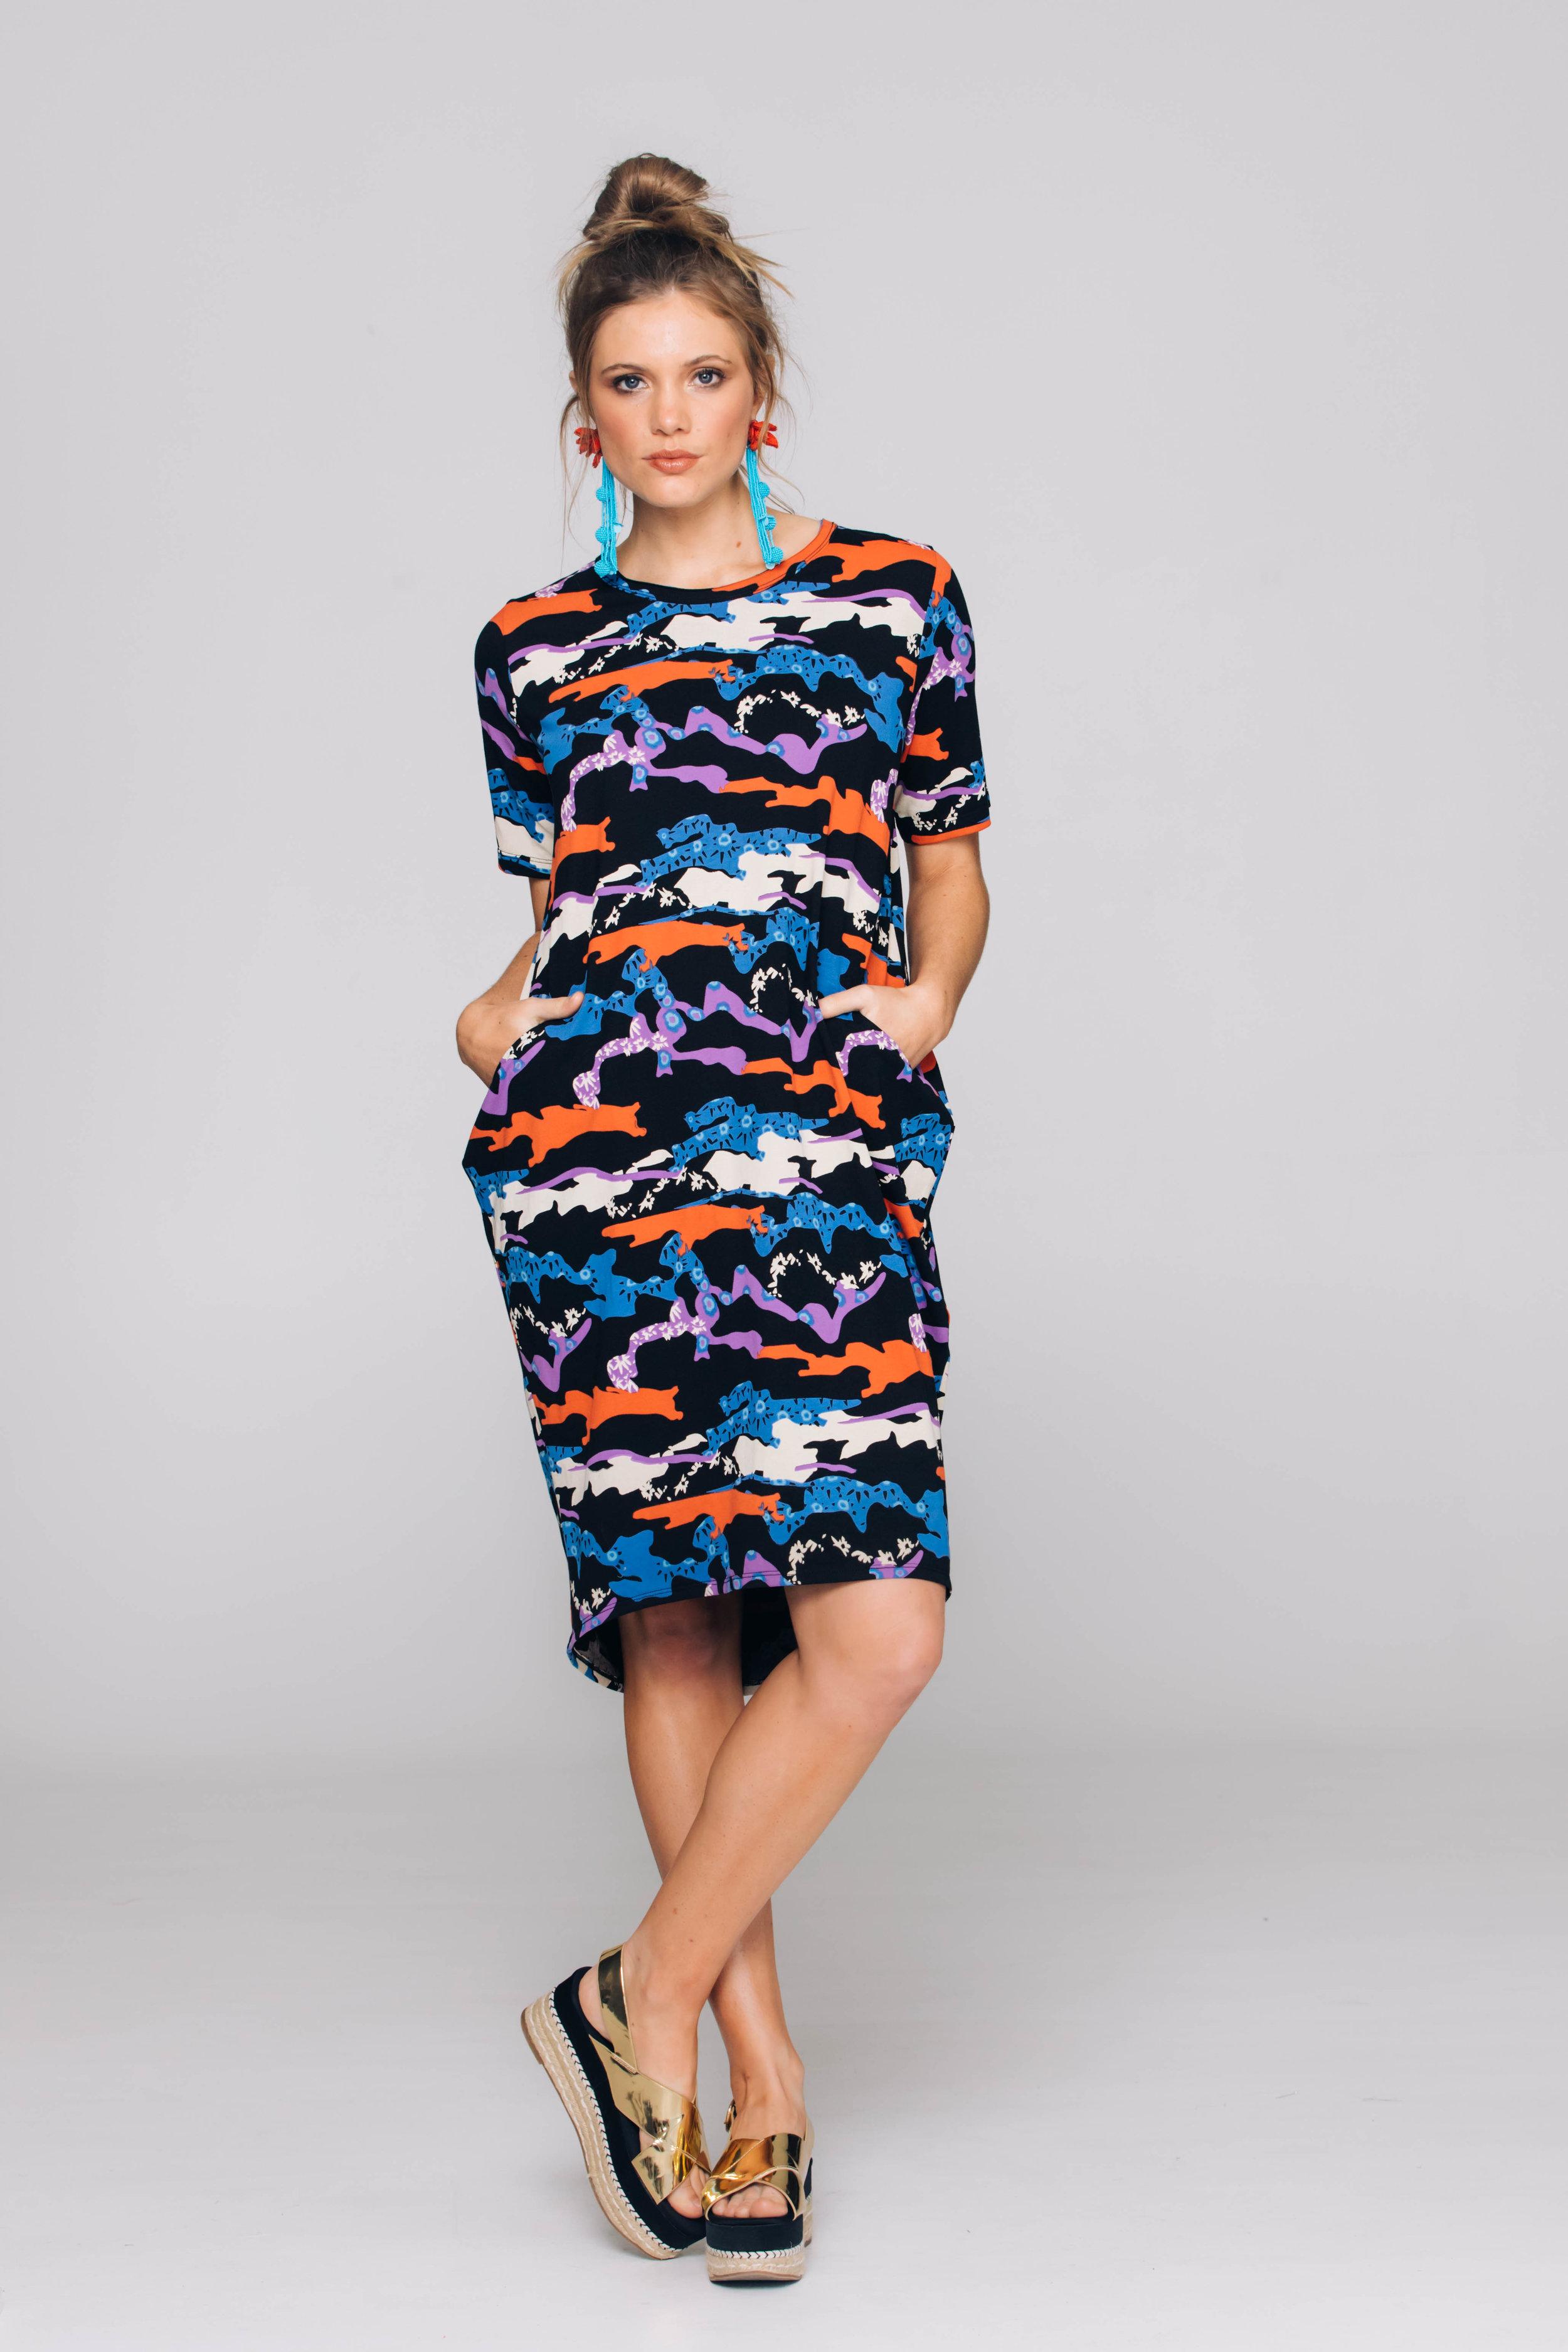 6163T Halo Dress, Cactus Black